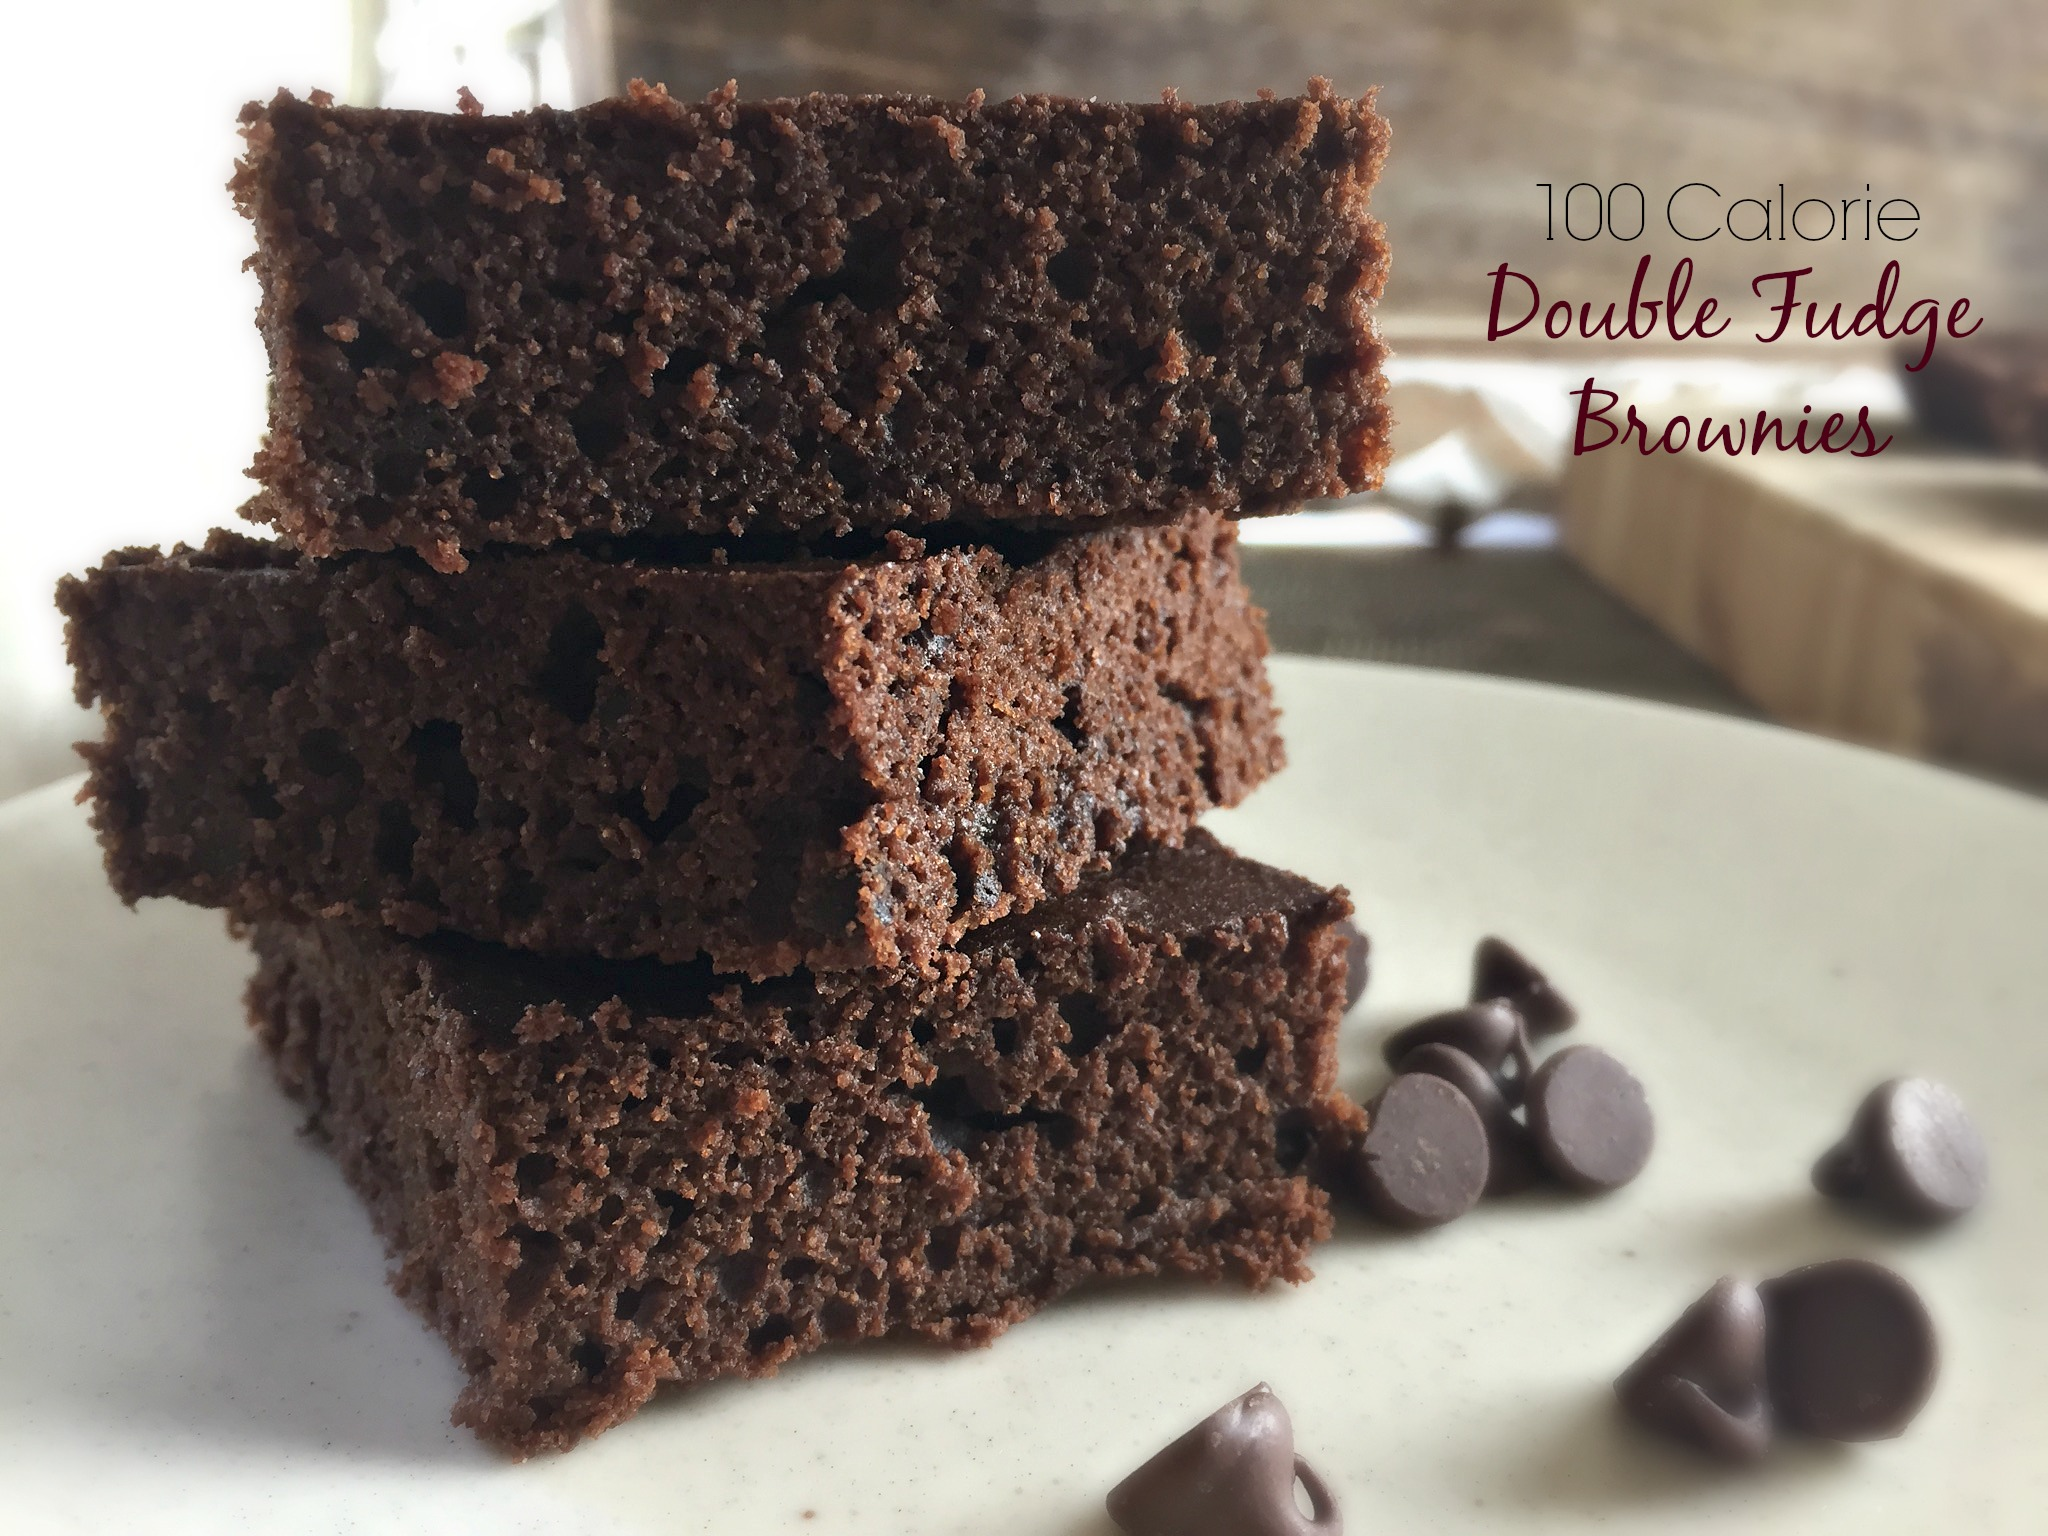 100 Calorie Double Fudge Brownies